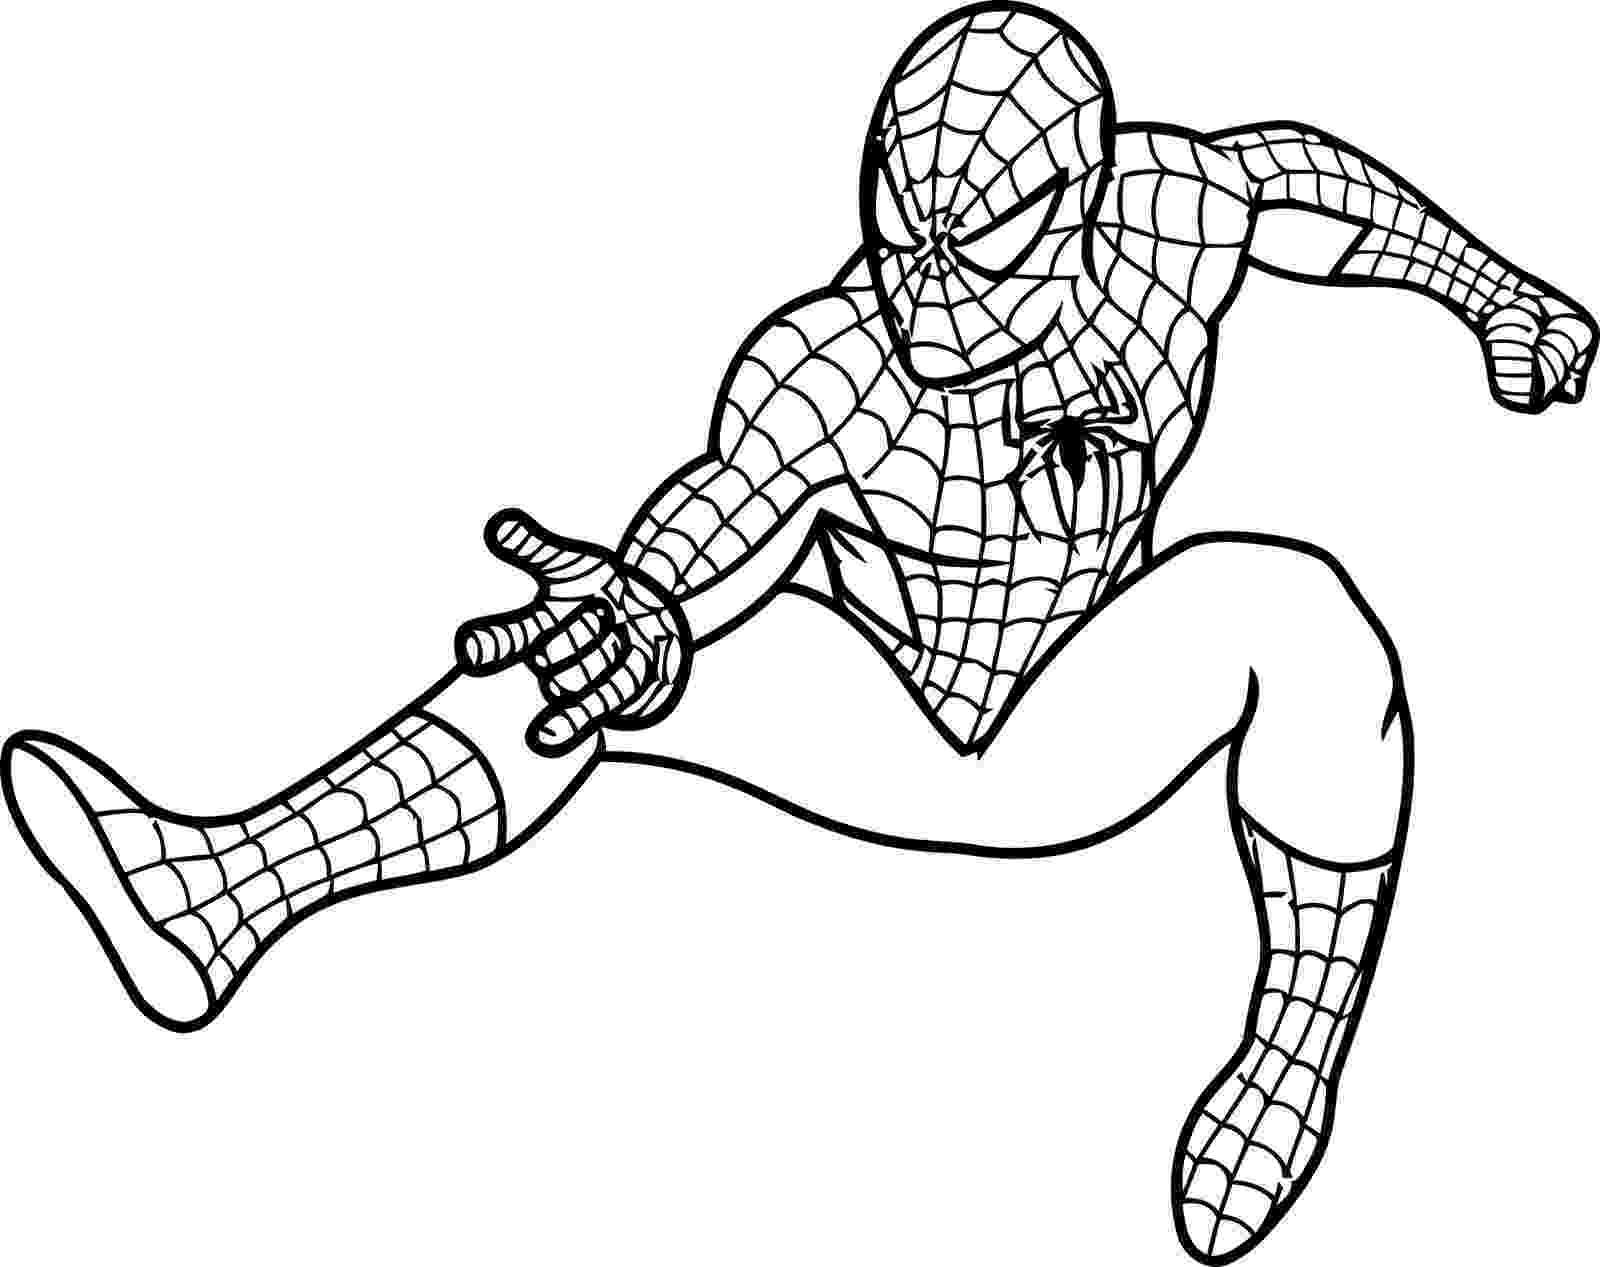 spiderman coloring books spiderman coloring pages spiderman coloring books